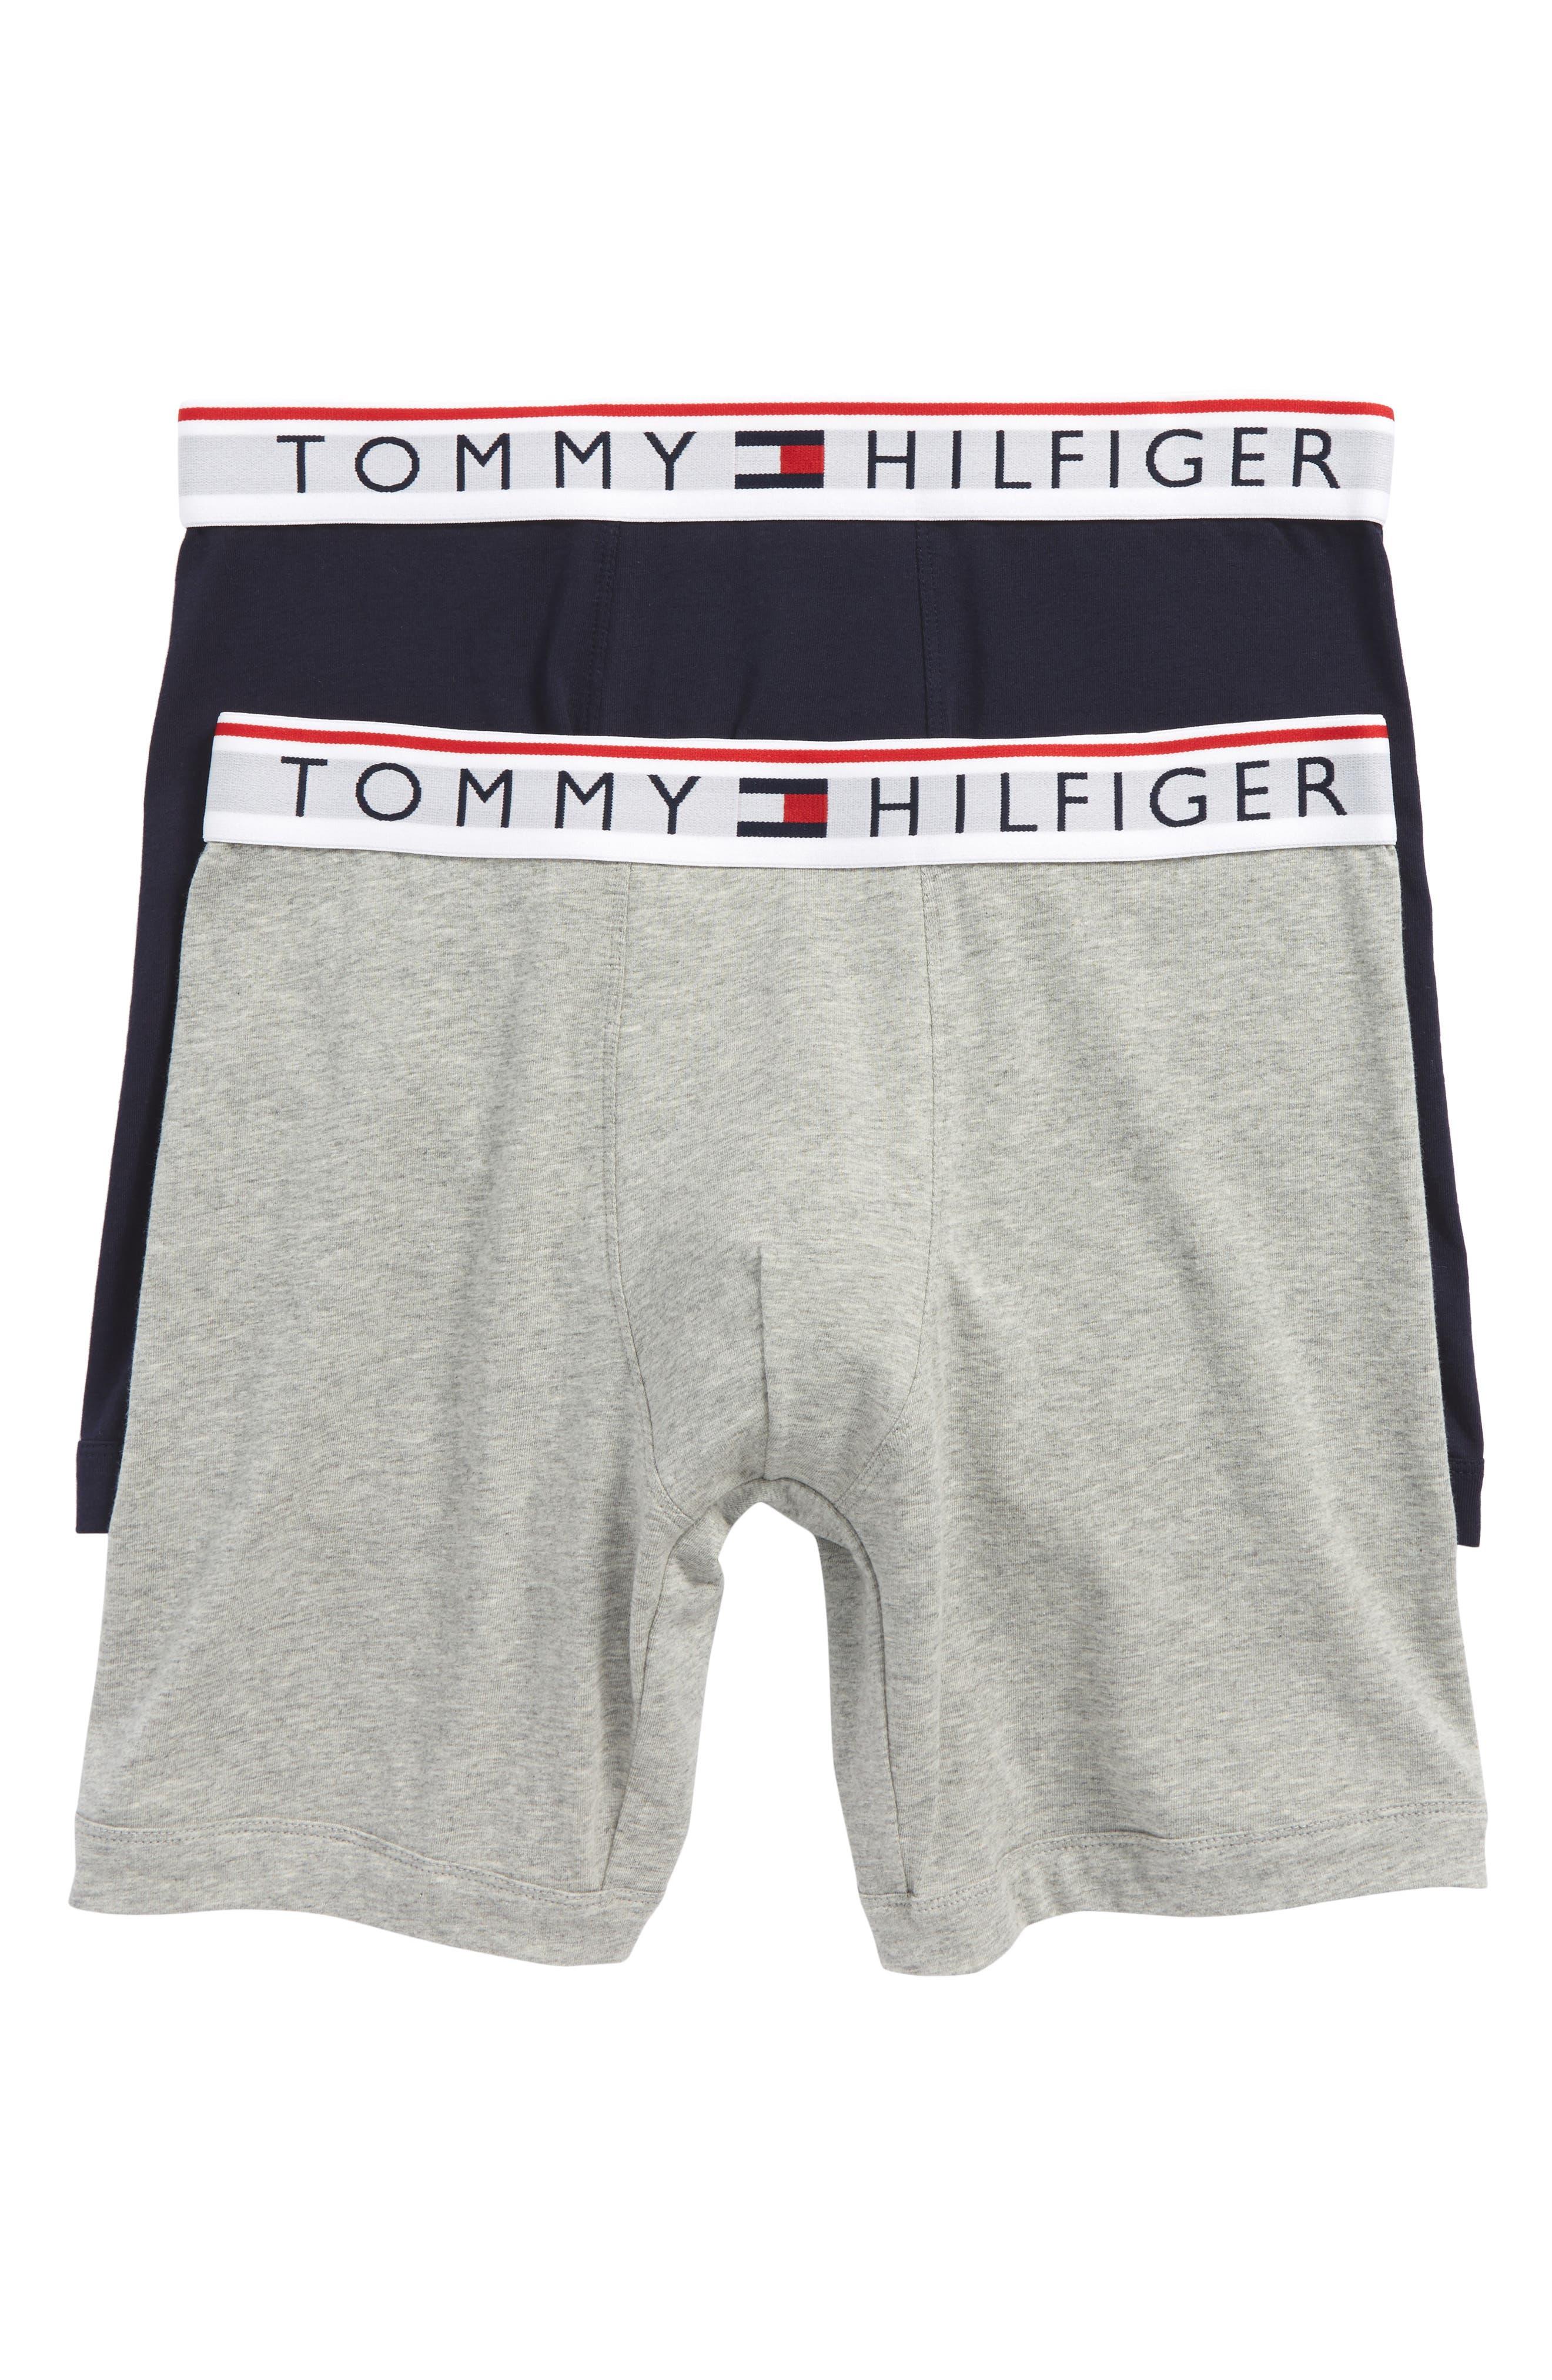 Tommy Hilfiger 2-Pack Boxer Briefs